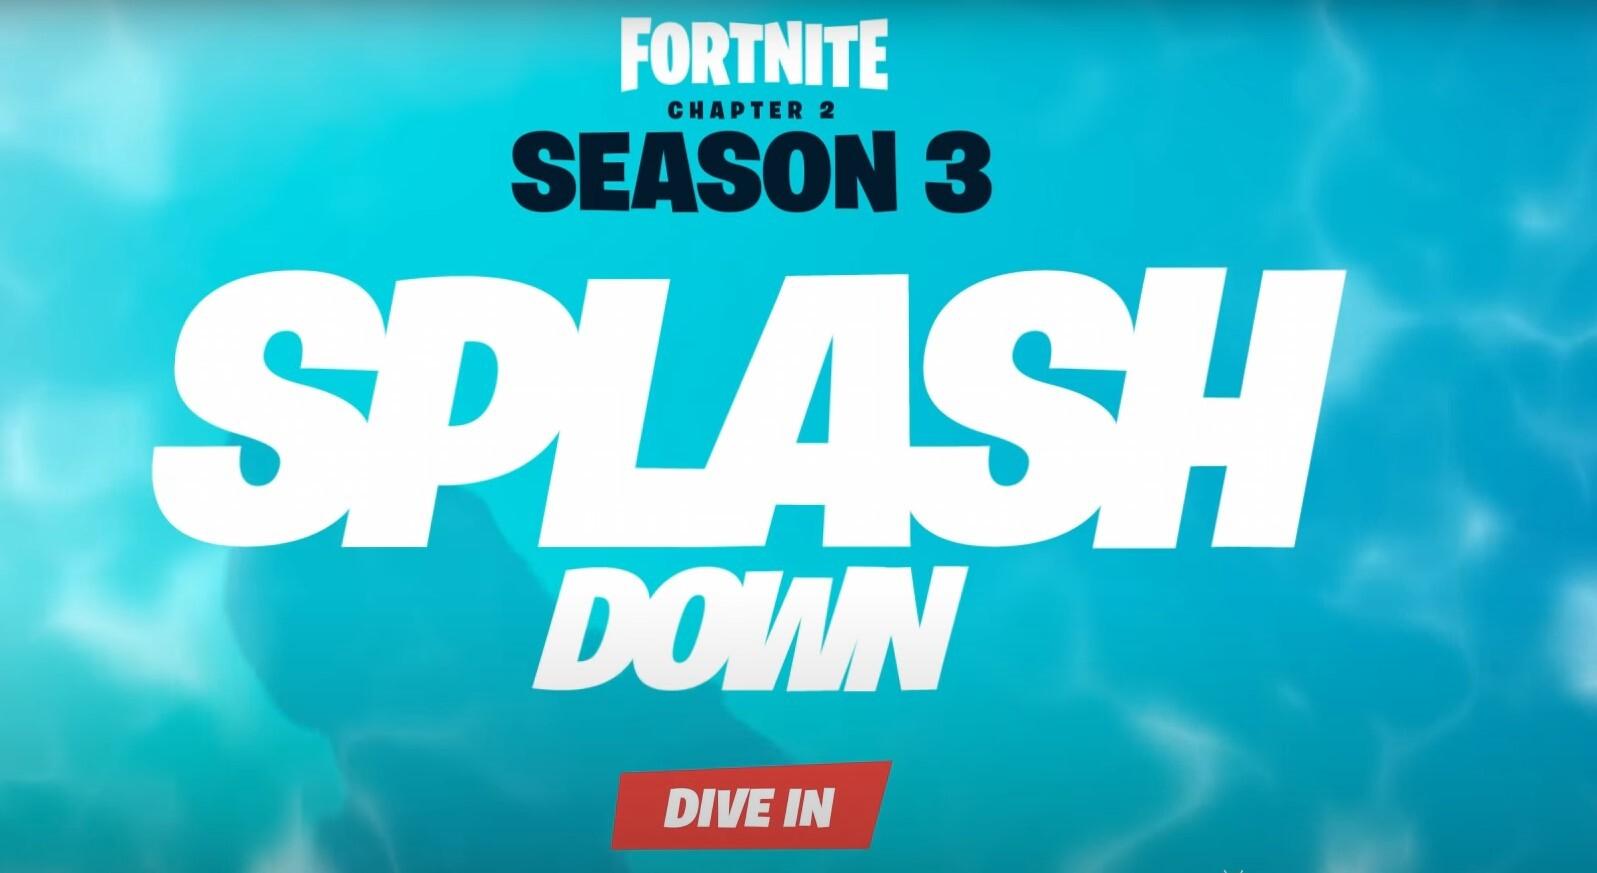 Fortnite Chapter 2 Season 3 Launch Trailer Revealed Dot Esports